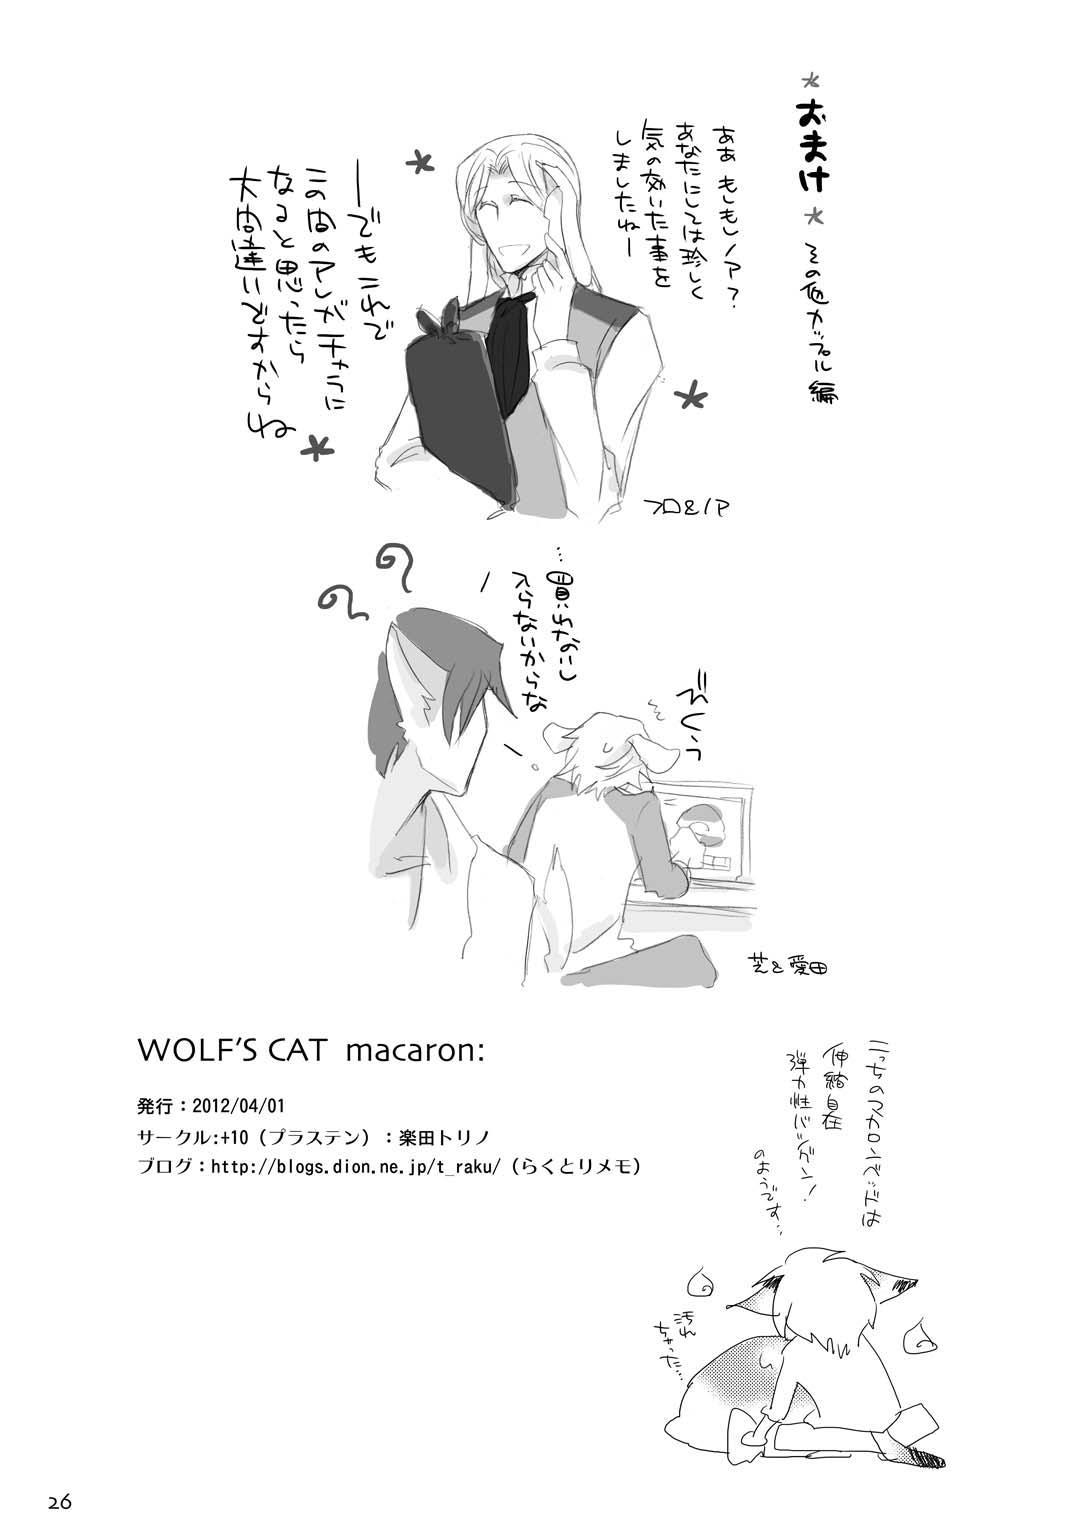 WOLF'S CAT Macaron: 25